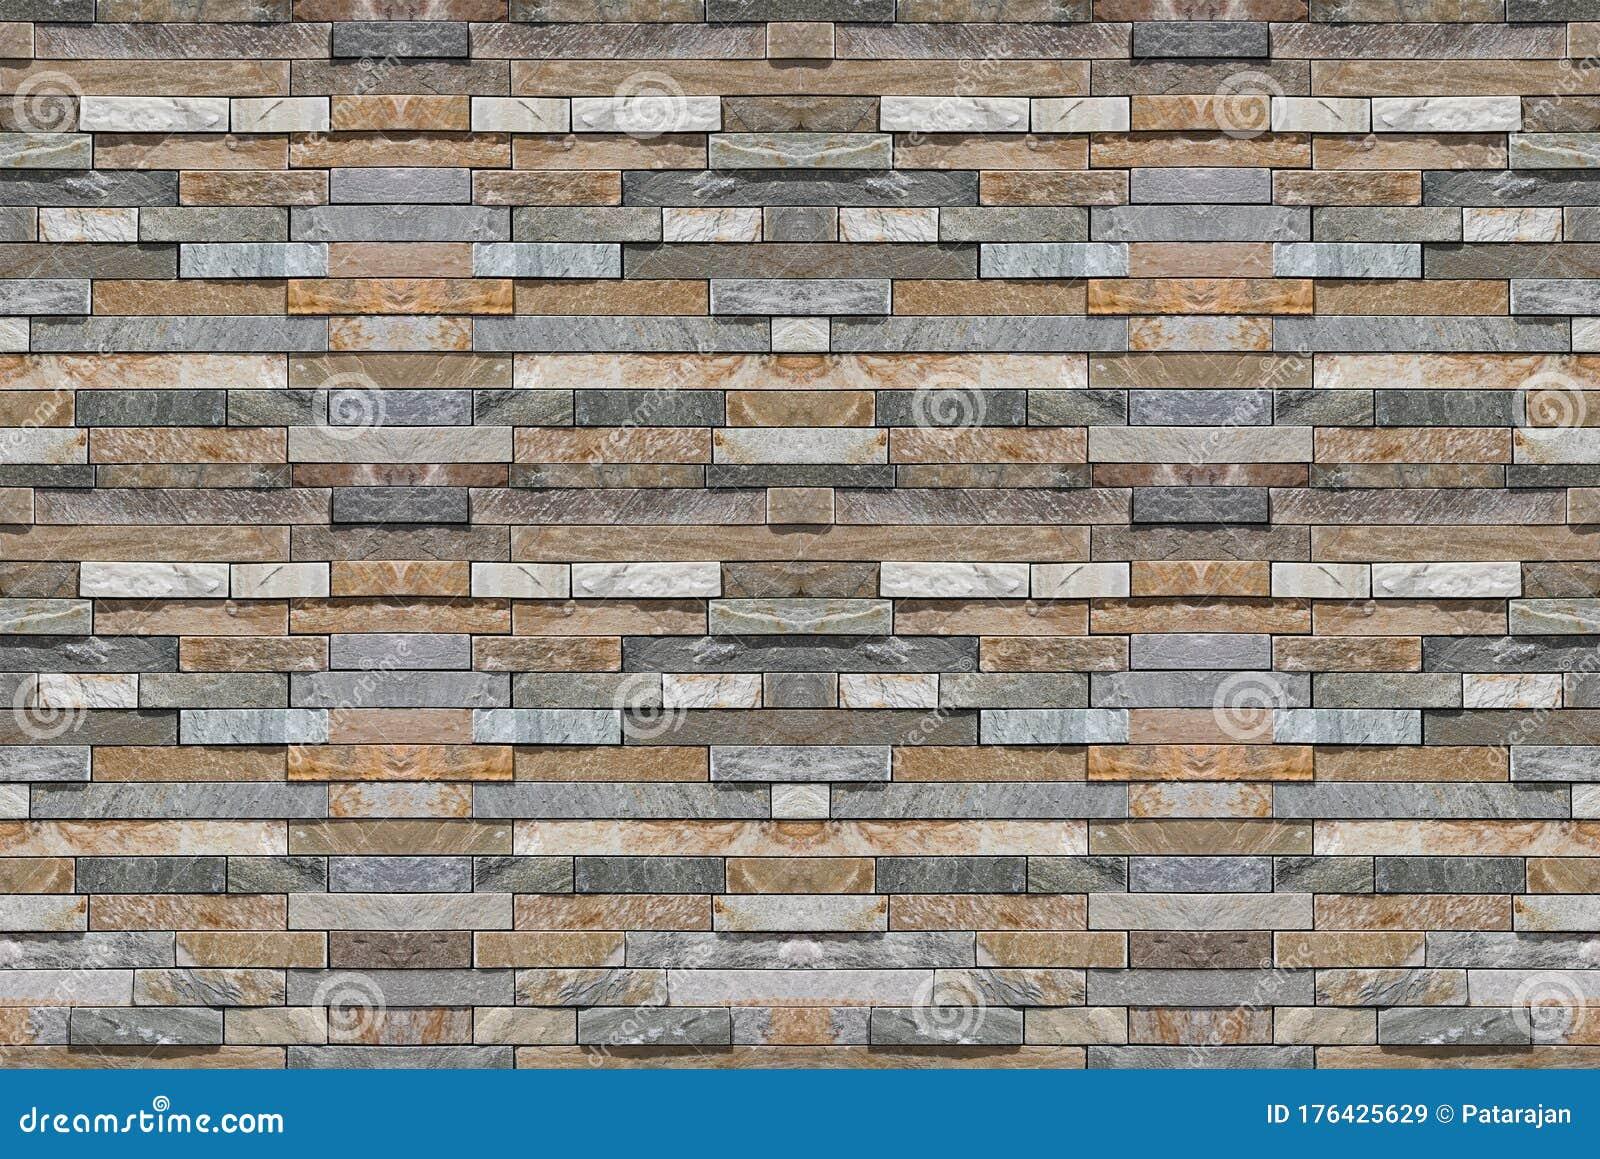 Modern Slim Design Marble Stone Brick Block Masonry Fence Wall Texture Background Stock Image Image Of Modern Decor 176425629